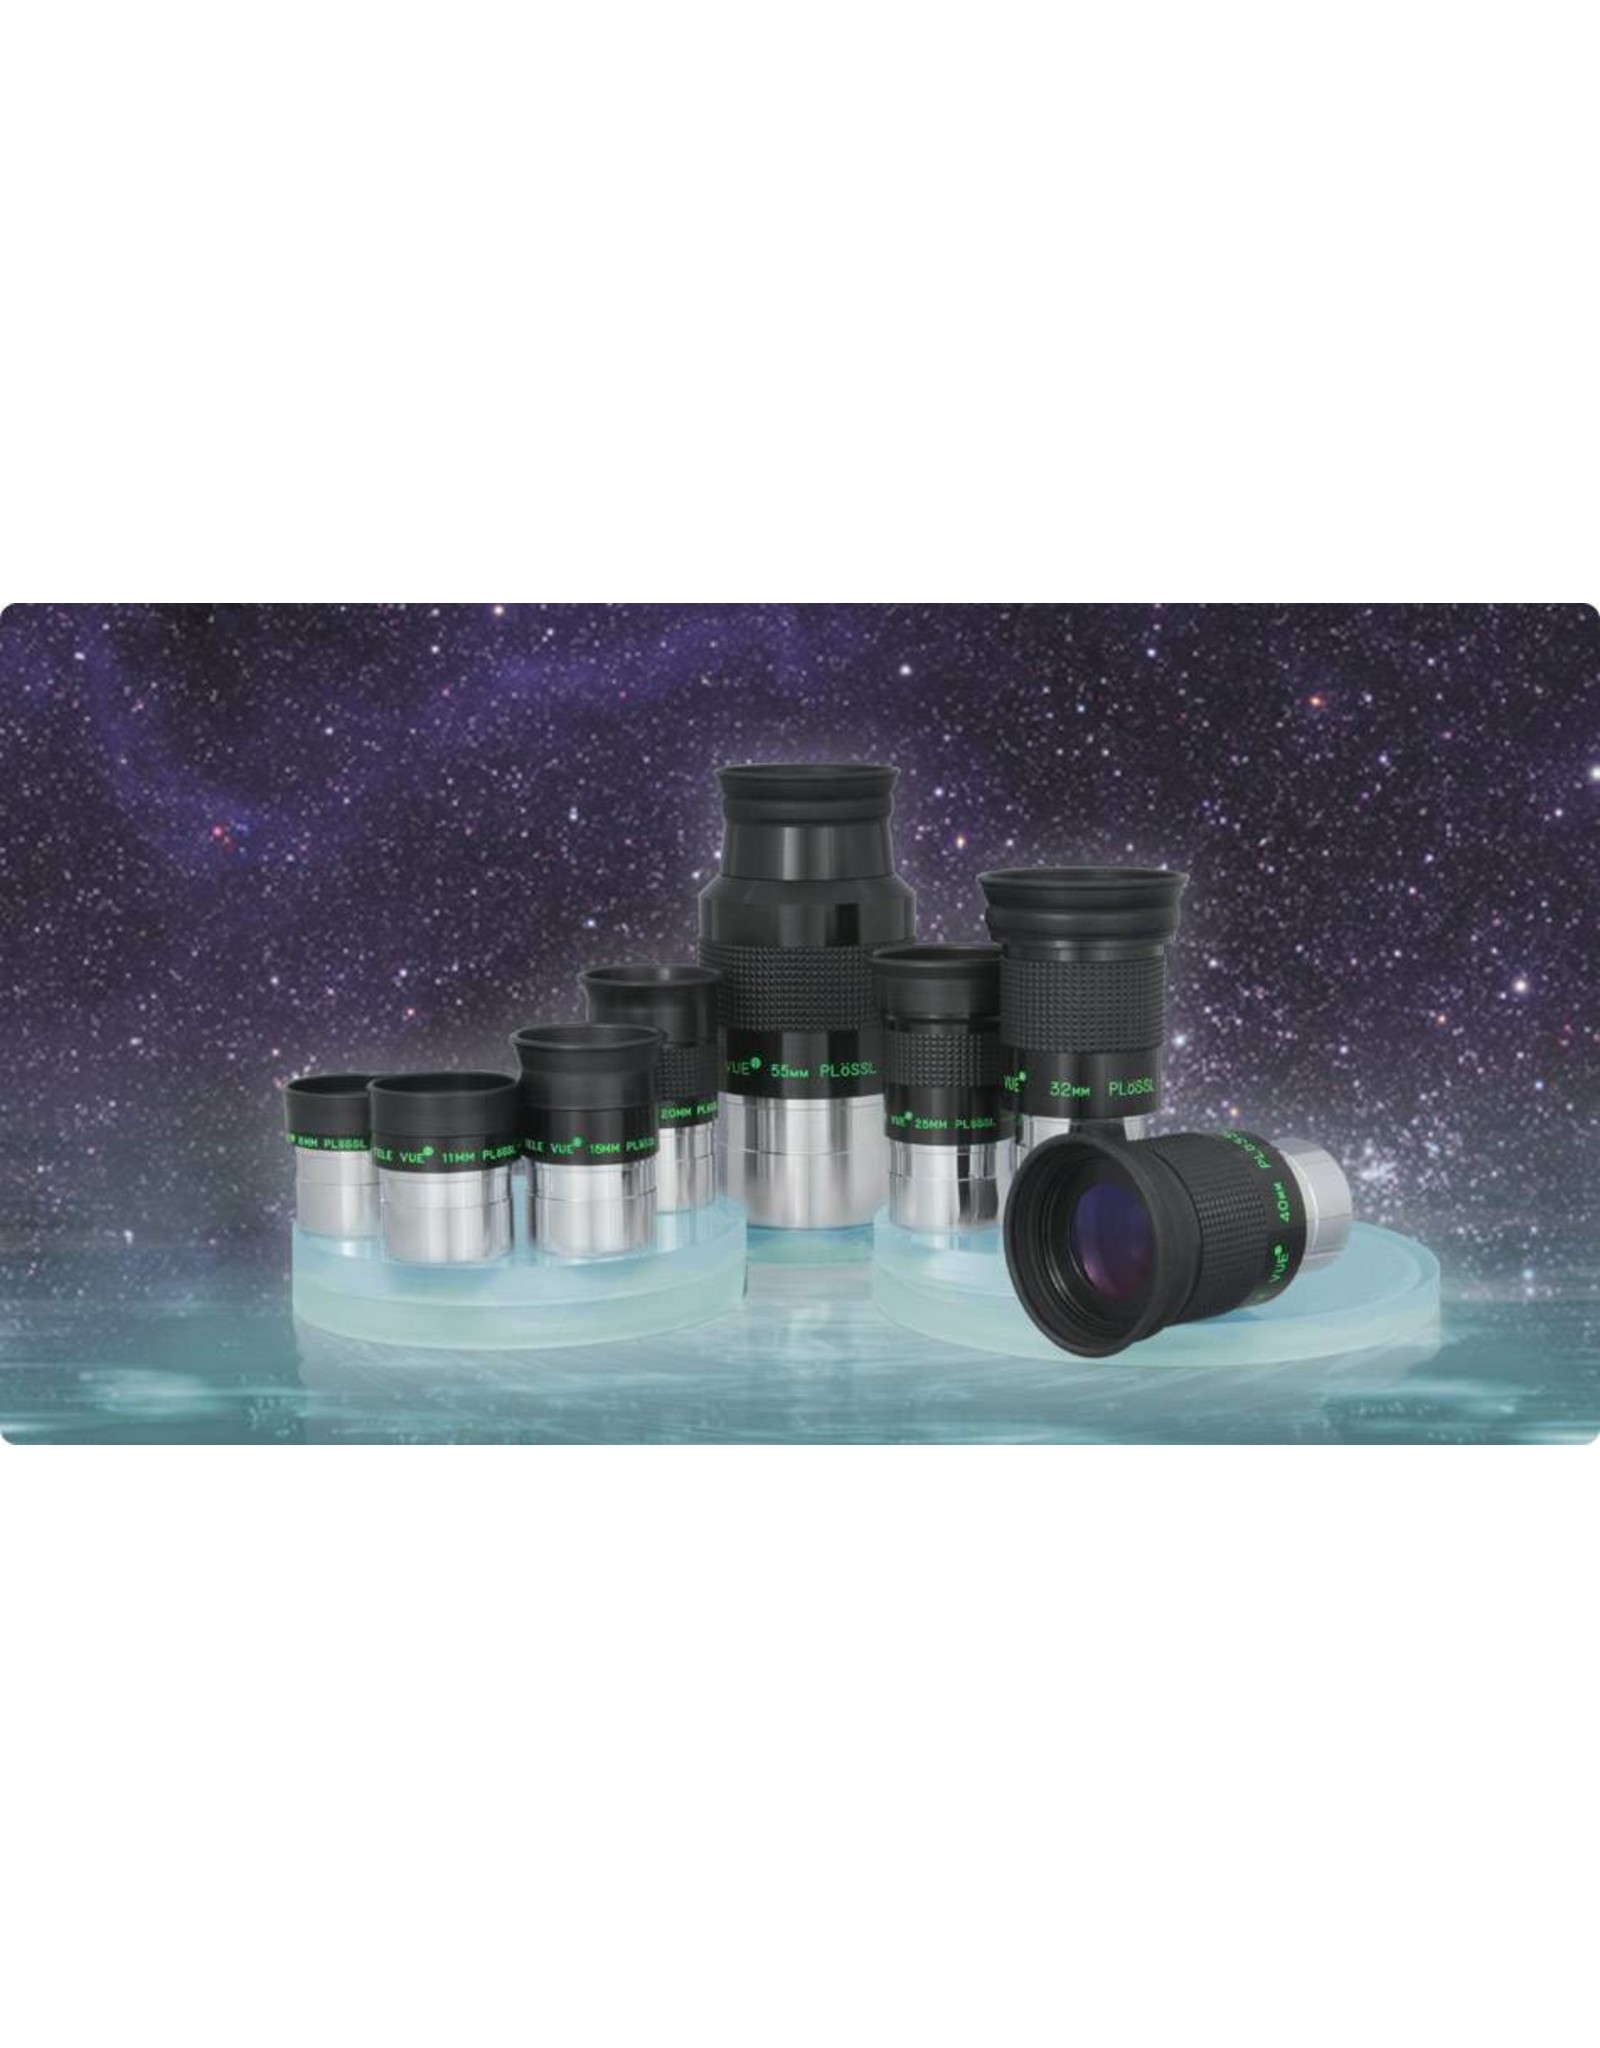 Tele Vue 11mm Plossl Eyepiece - 1.25